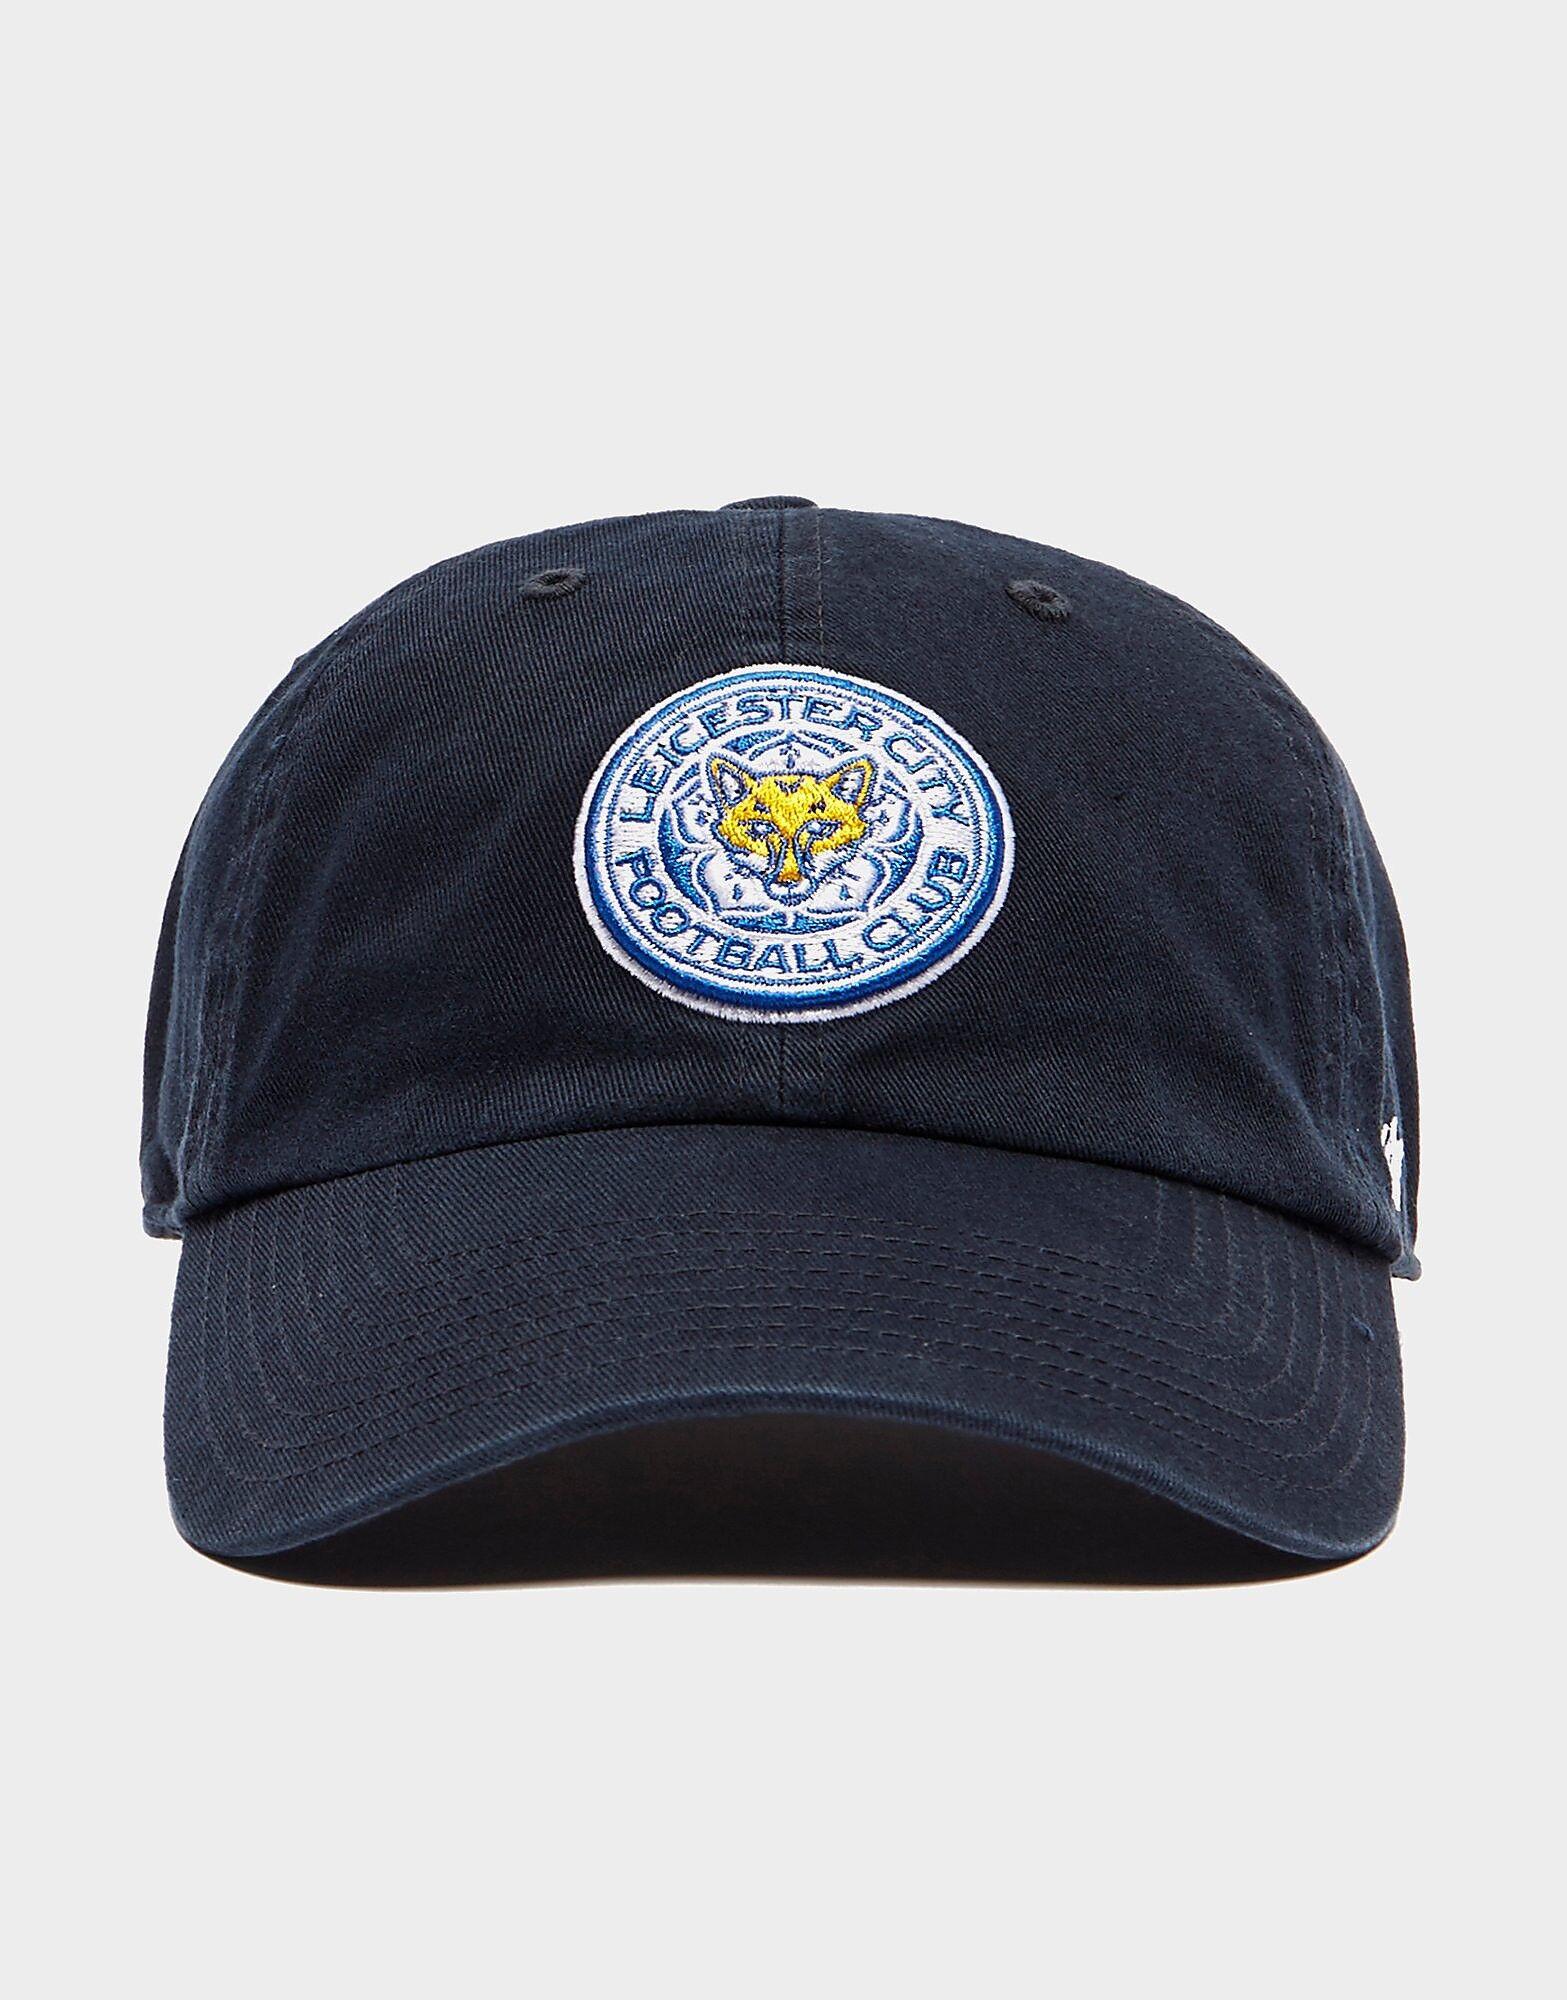 47 Brand Leicester City FC Clean Up Cap - Mens, Laivastonsininen